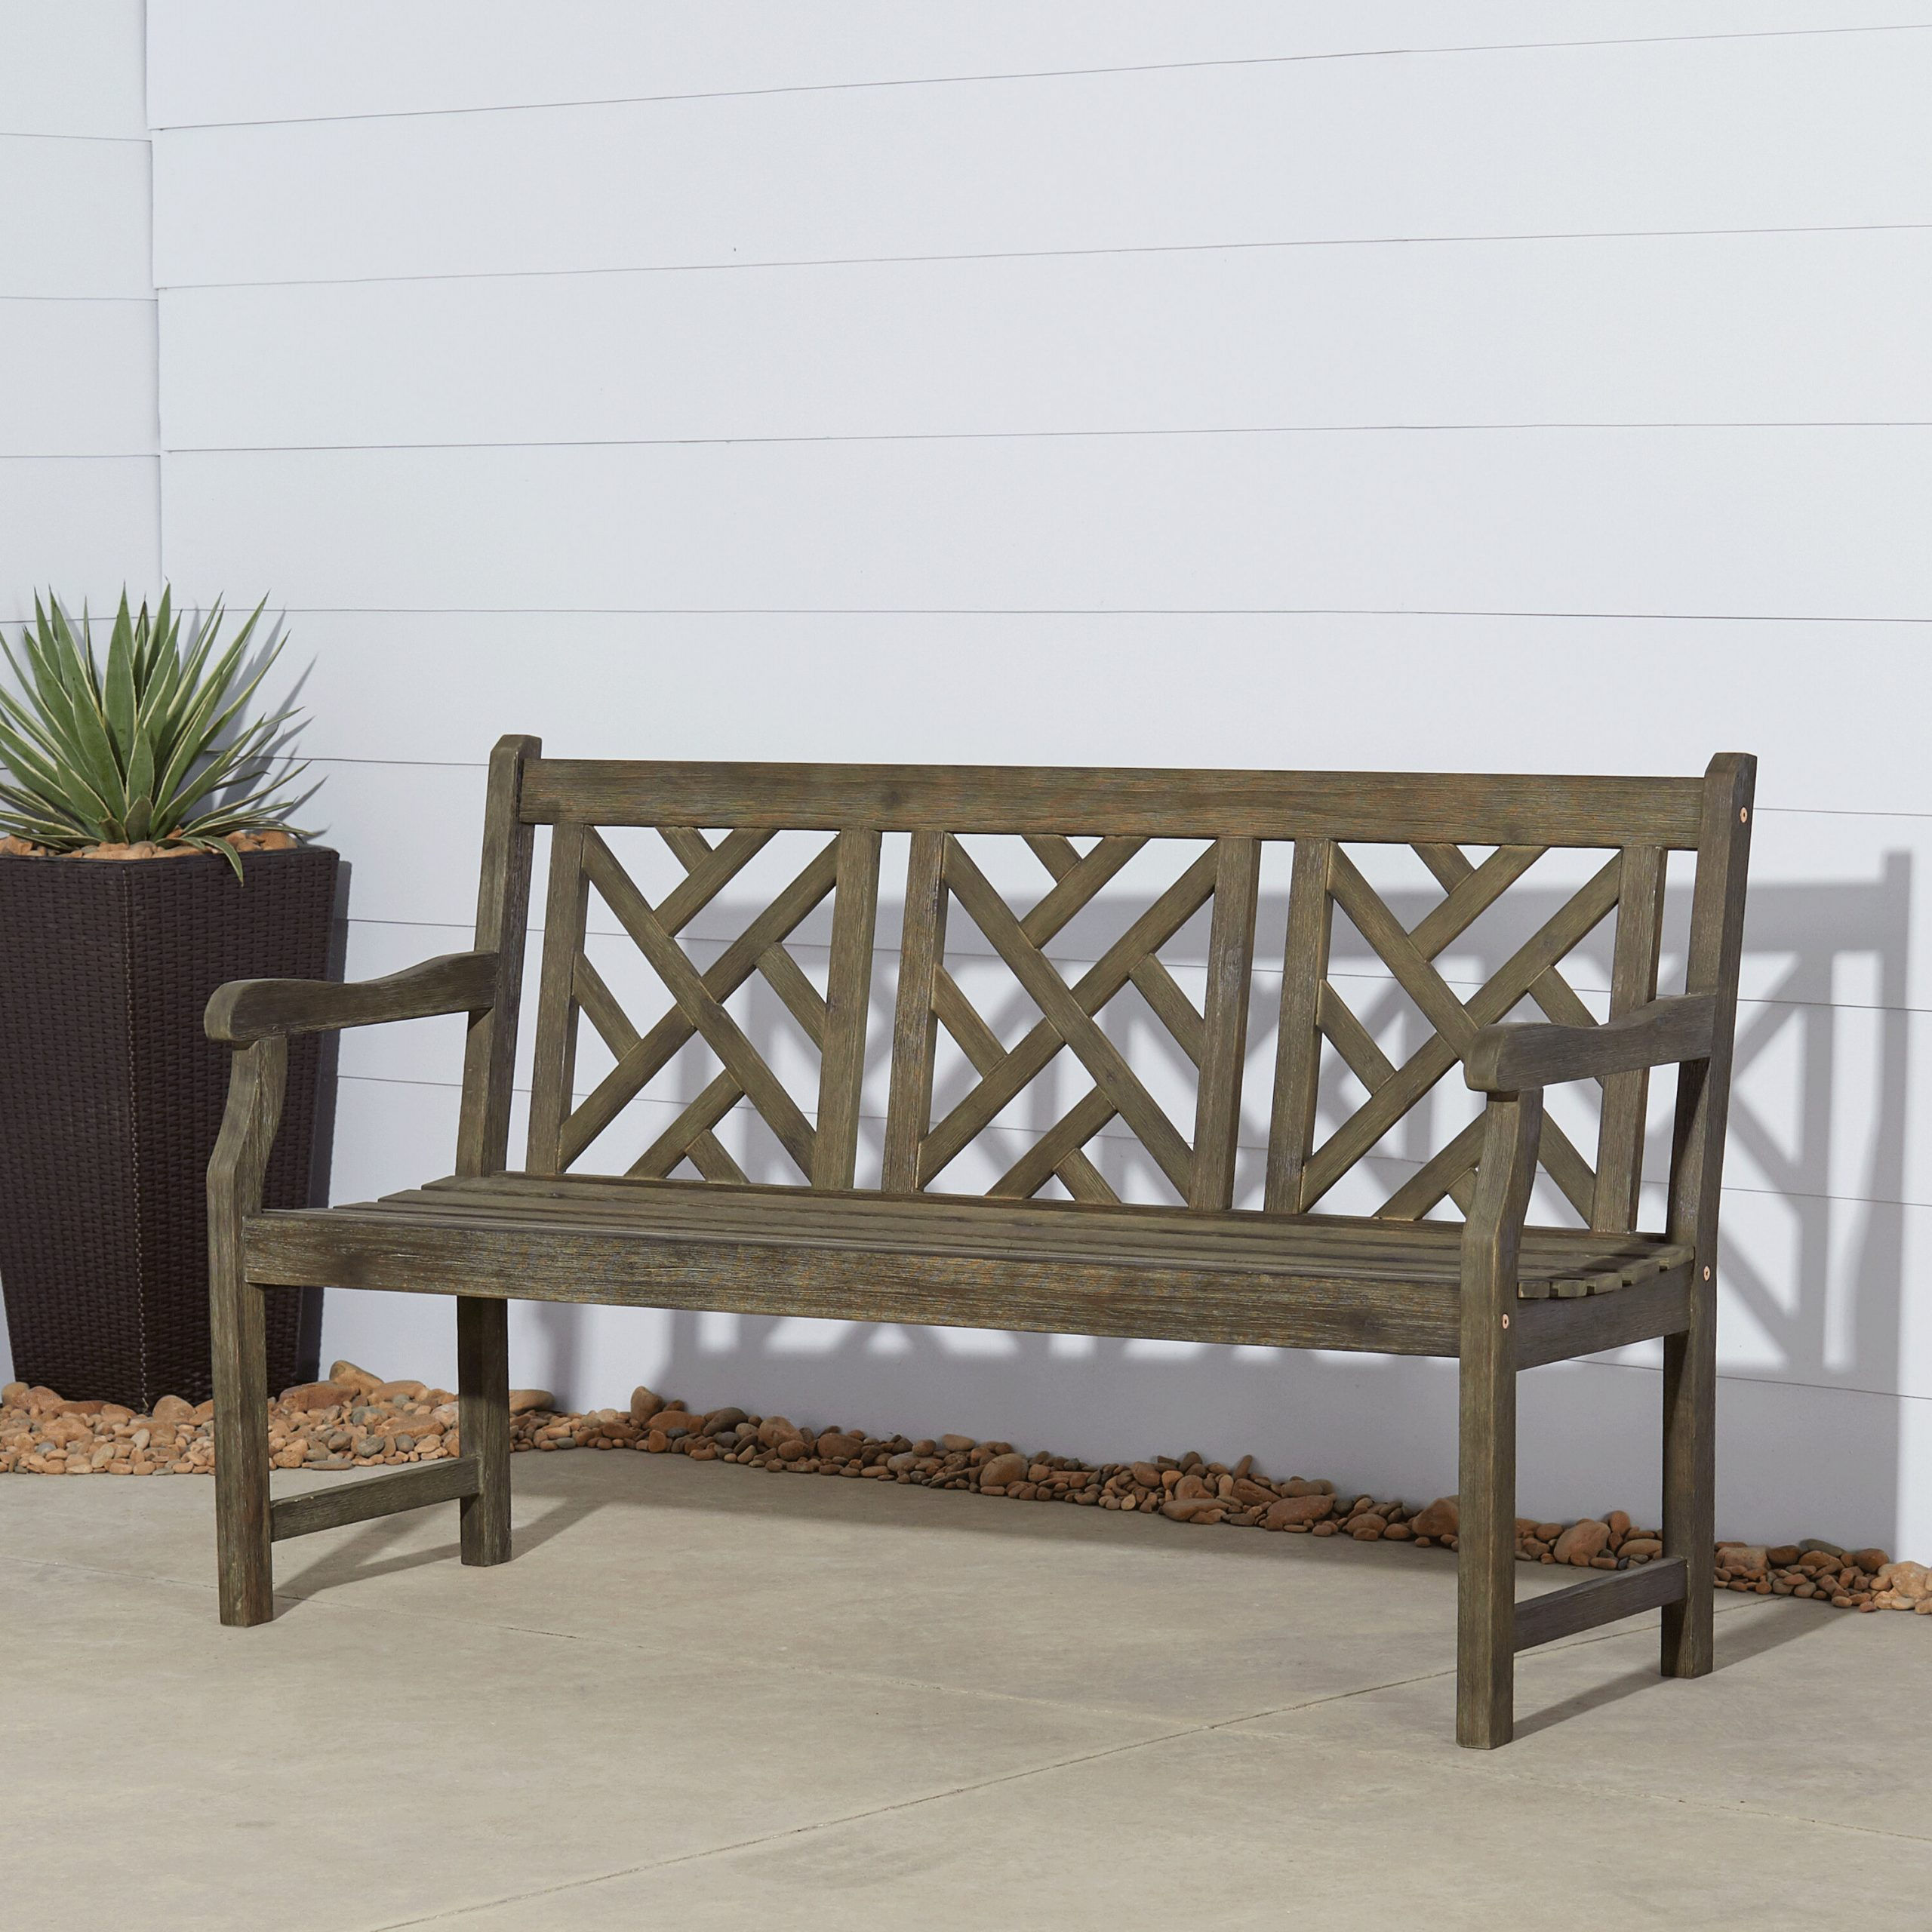 Three Posts™ Elsner Acacia Garden Bench Within Avoca Wood Garden Benches (View 19 of 25)